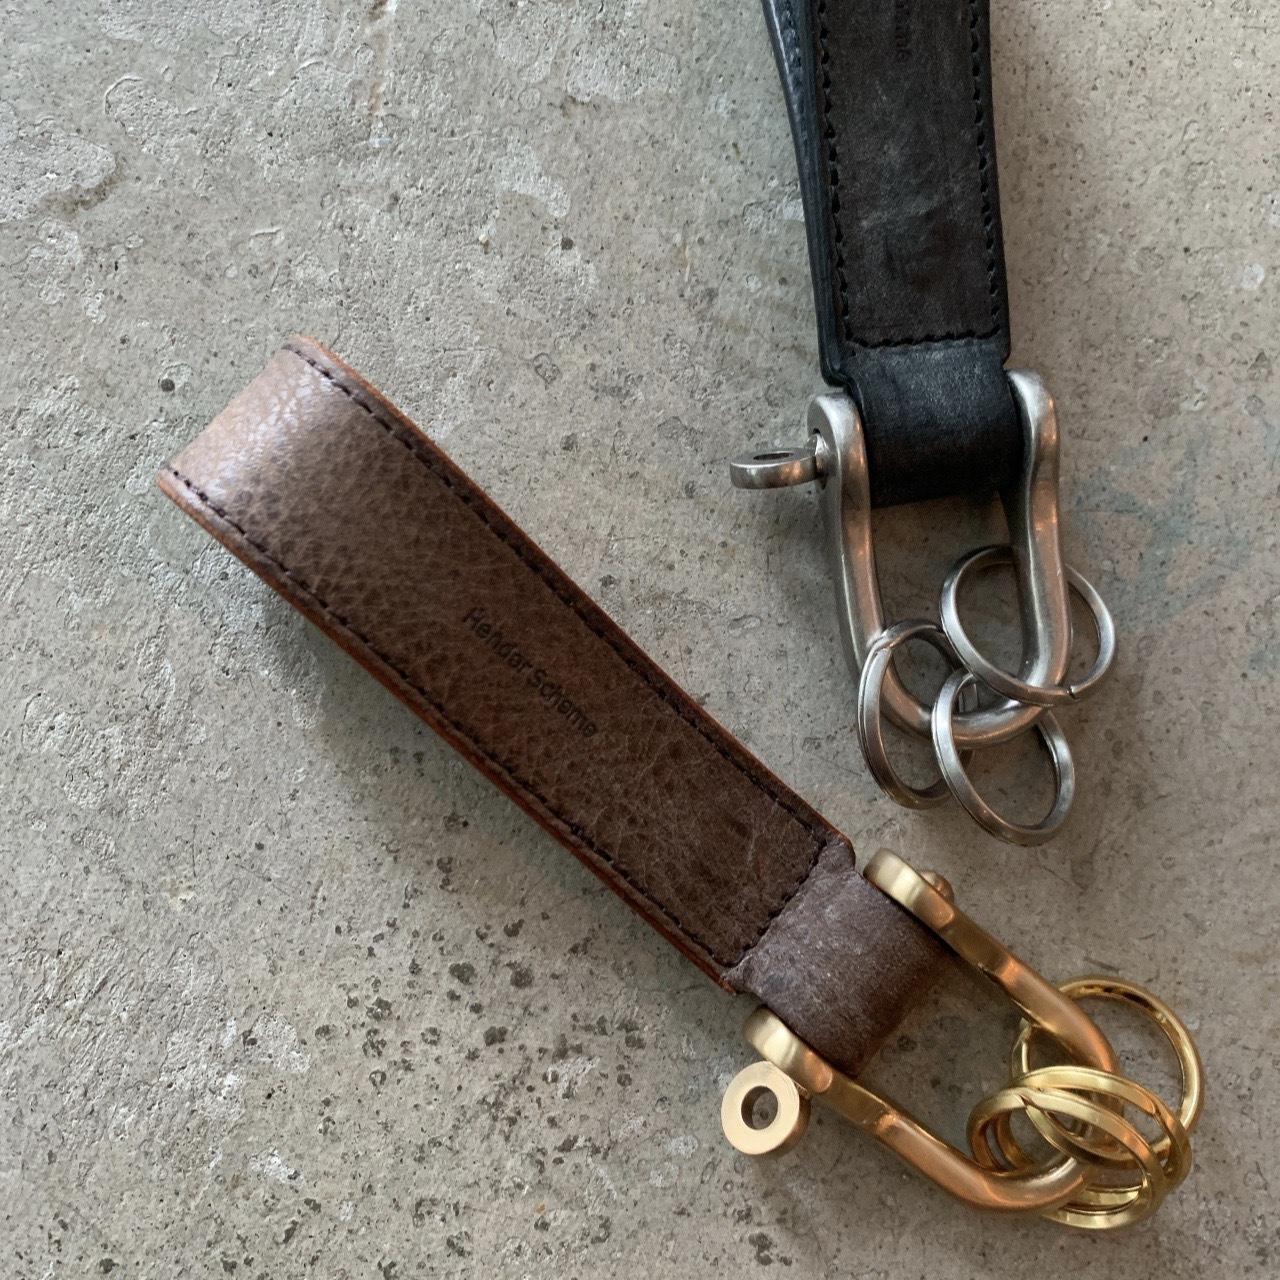 Hender Scheme - key shackle